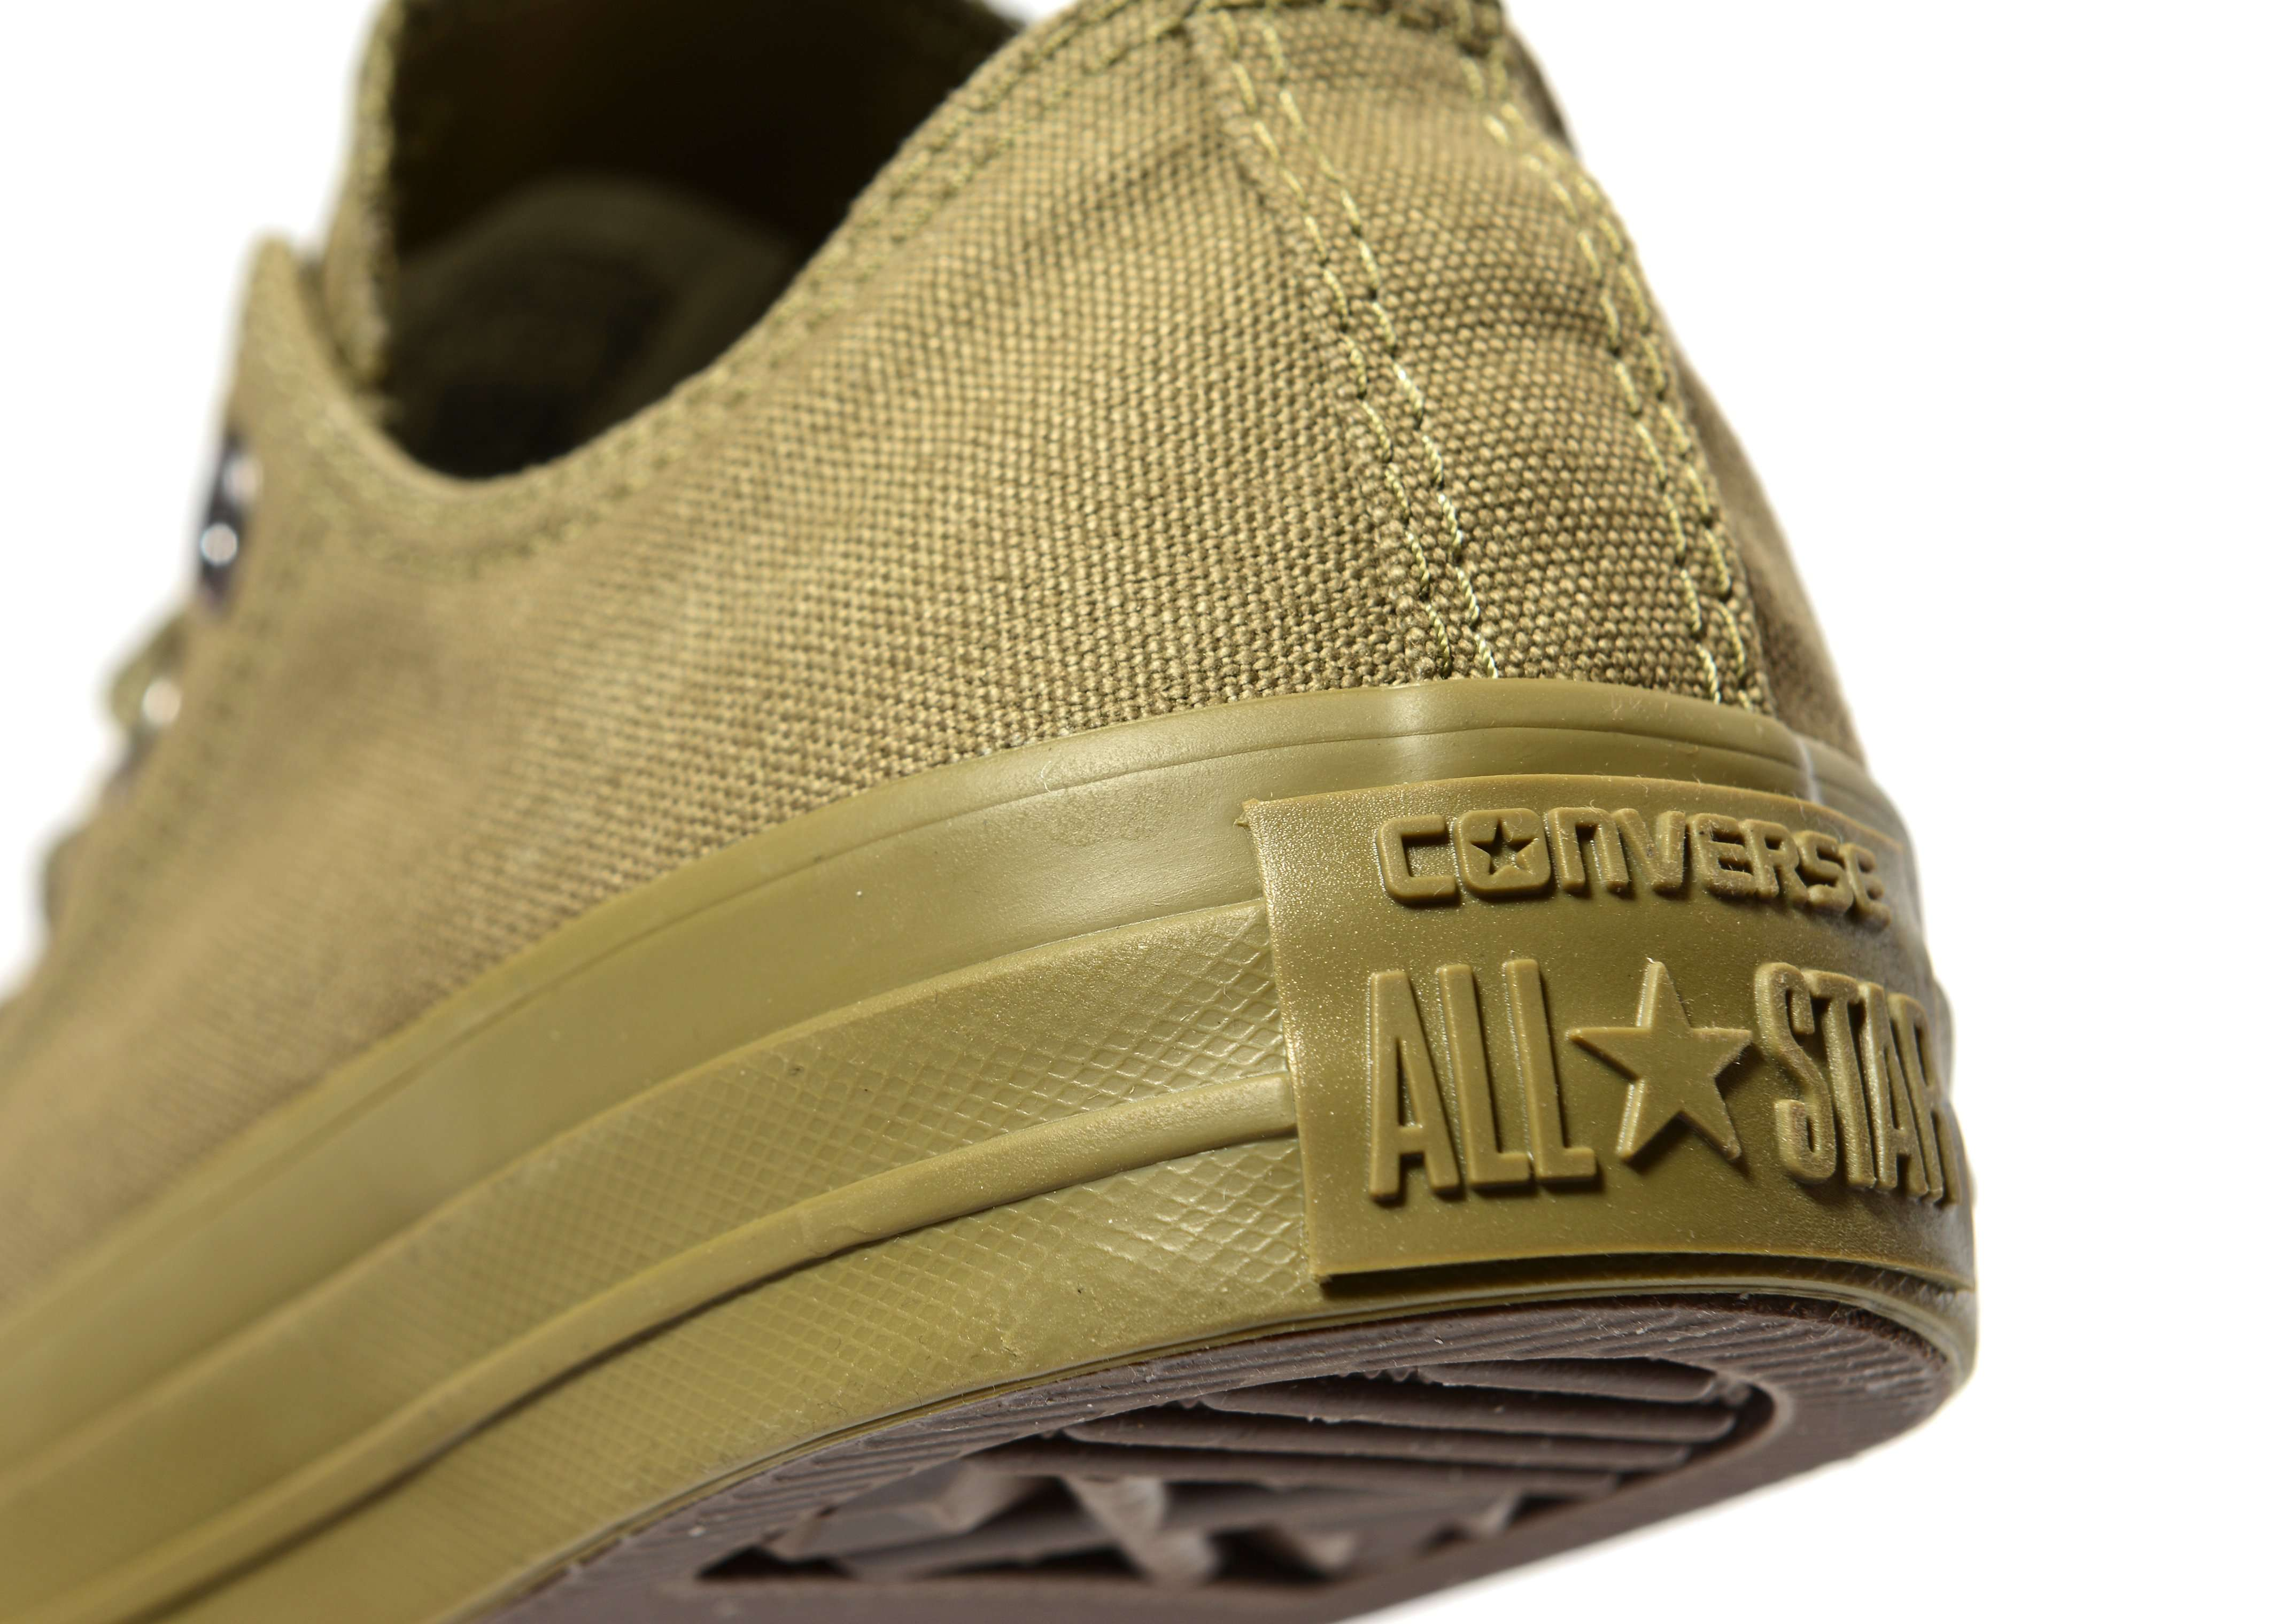 Converse All Star Ox Mono Women's